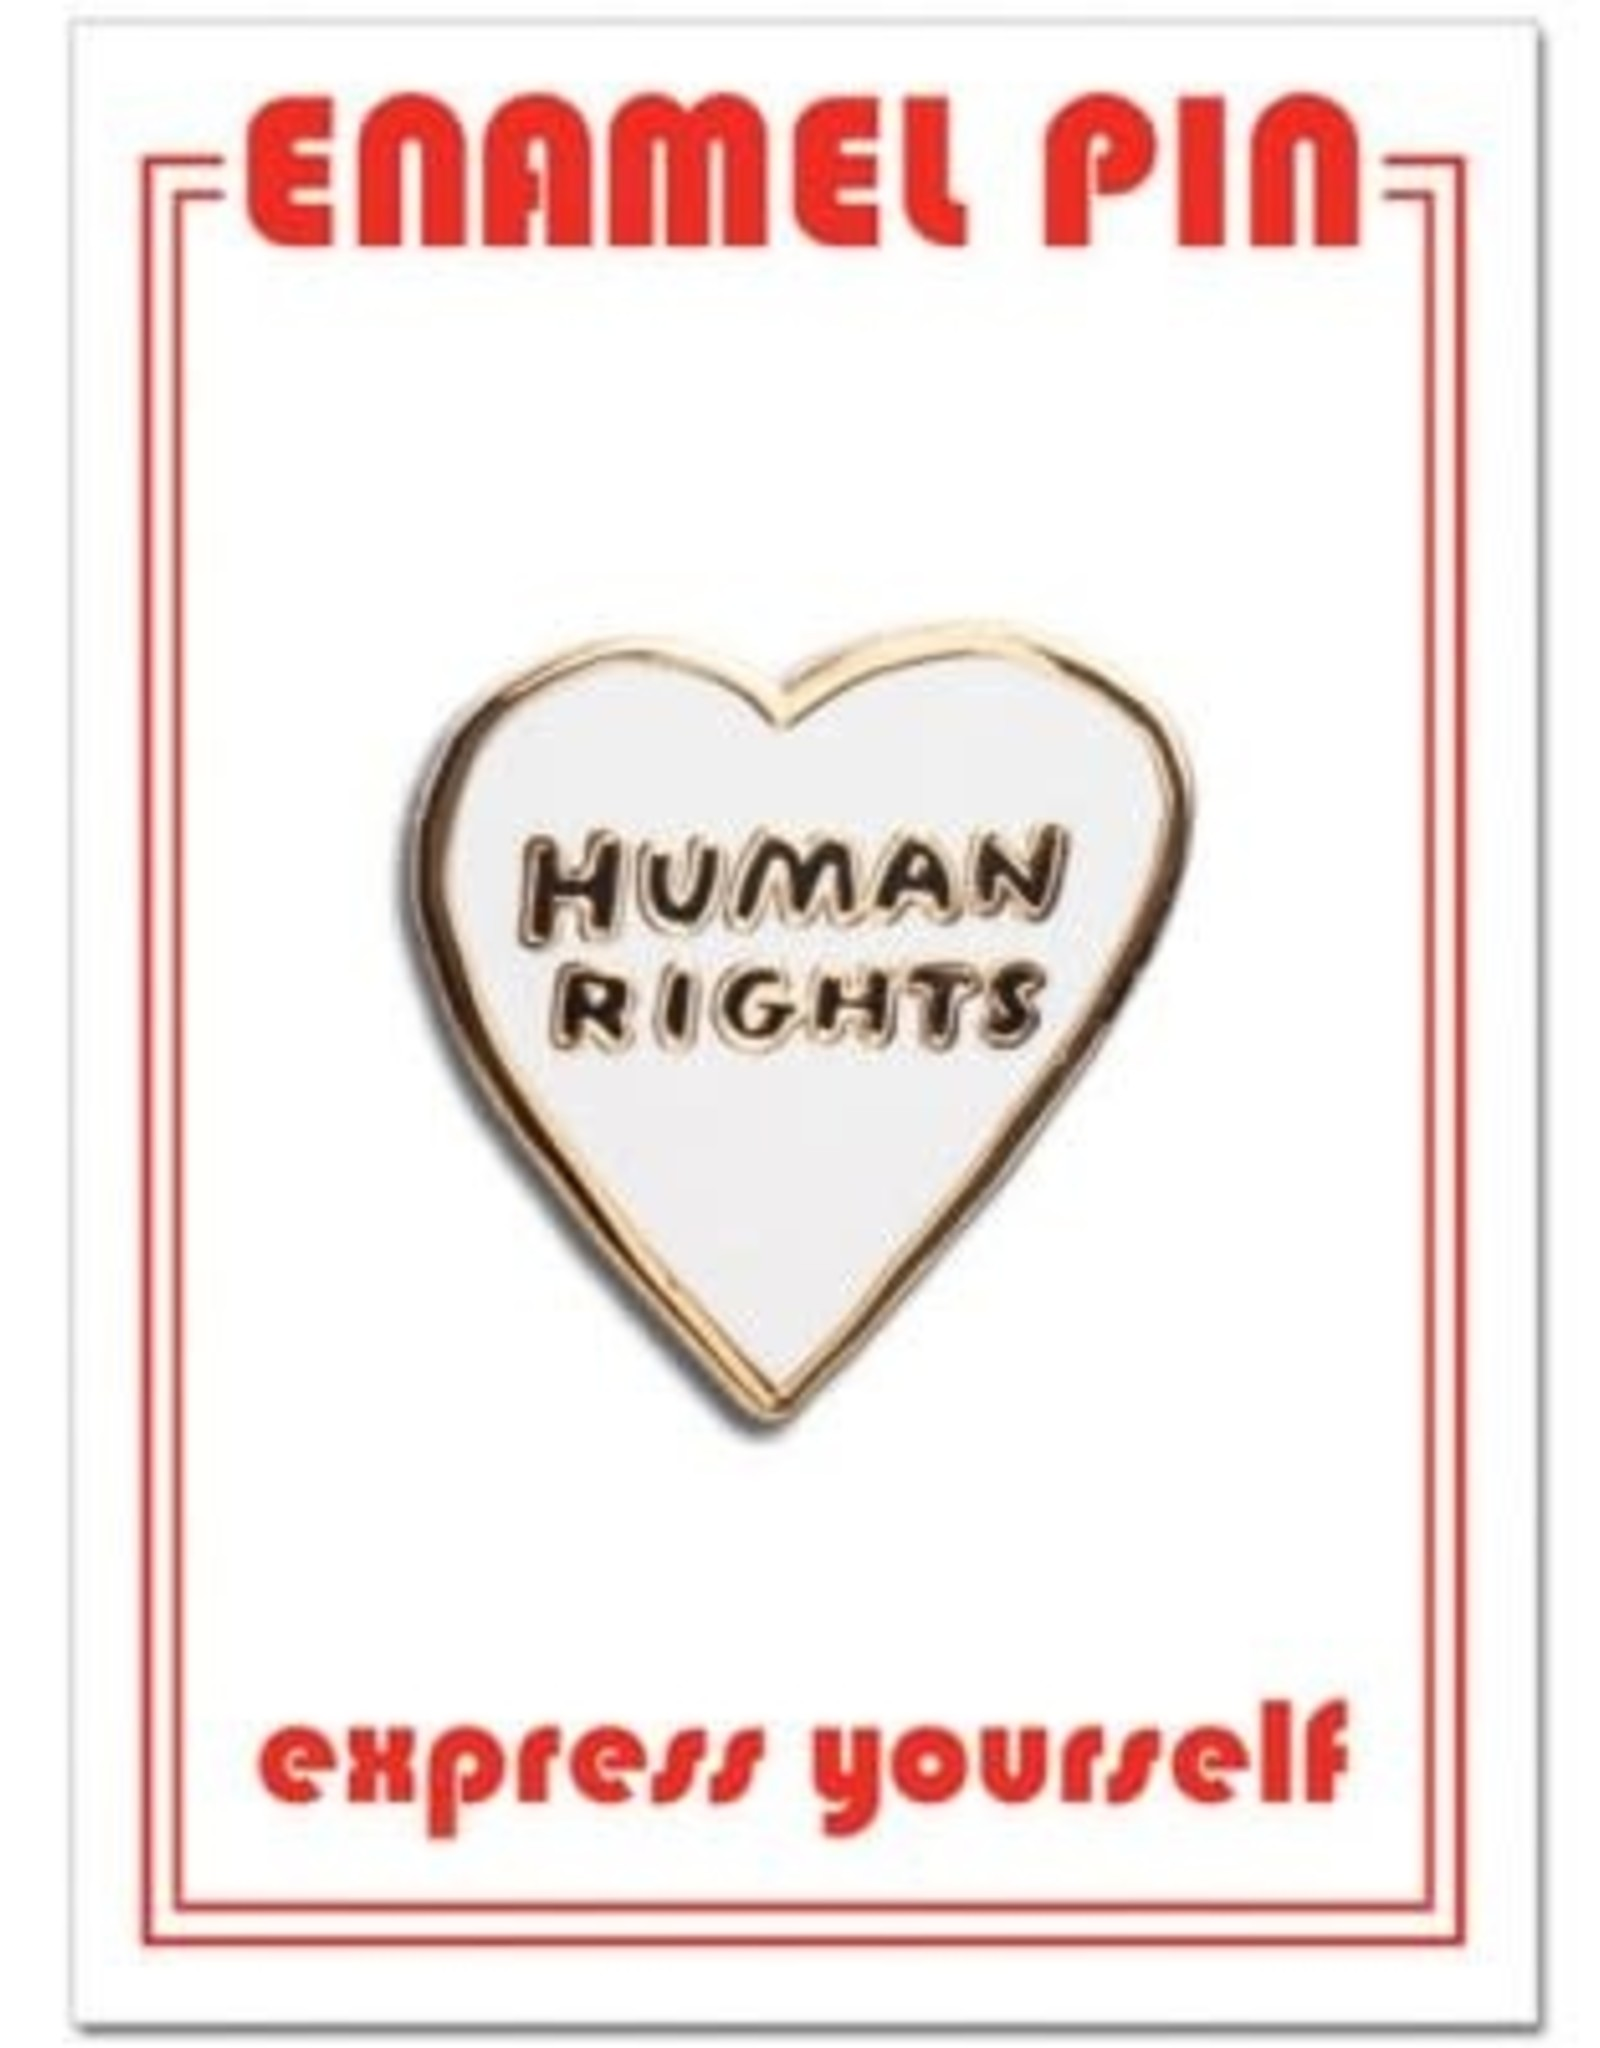 Human Rights Heart Enamel Pin